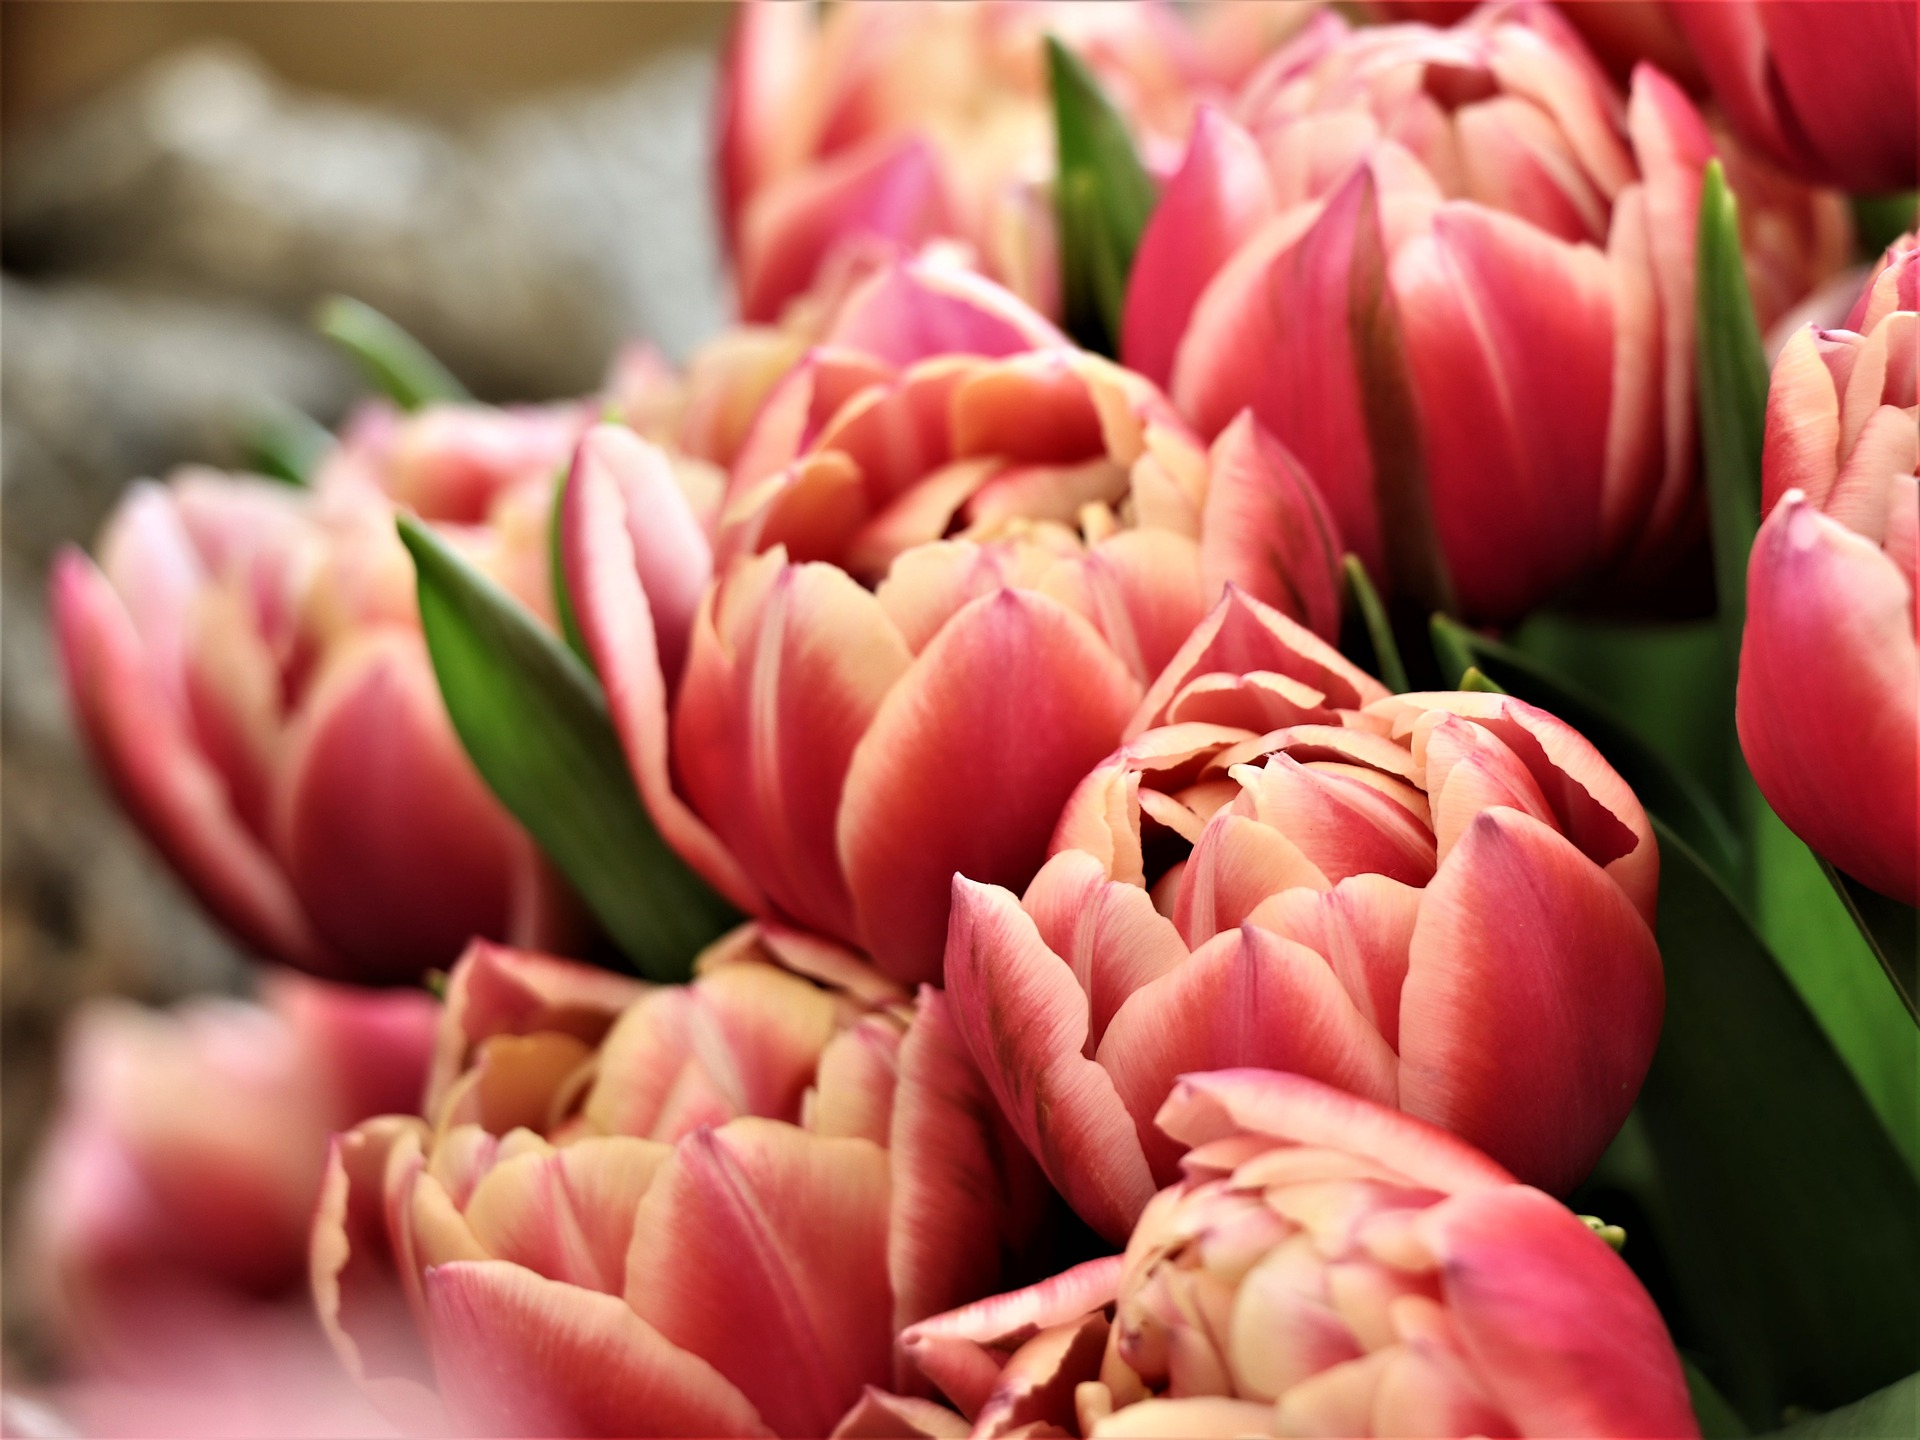 tulips-4030194_1920.jpg